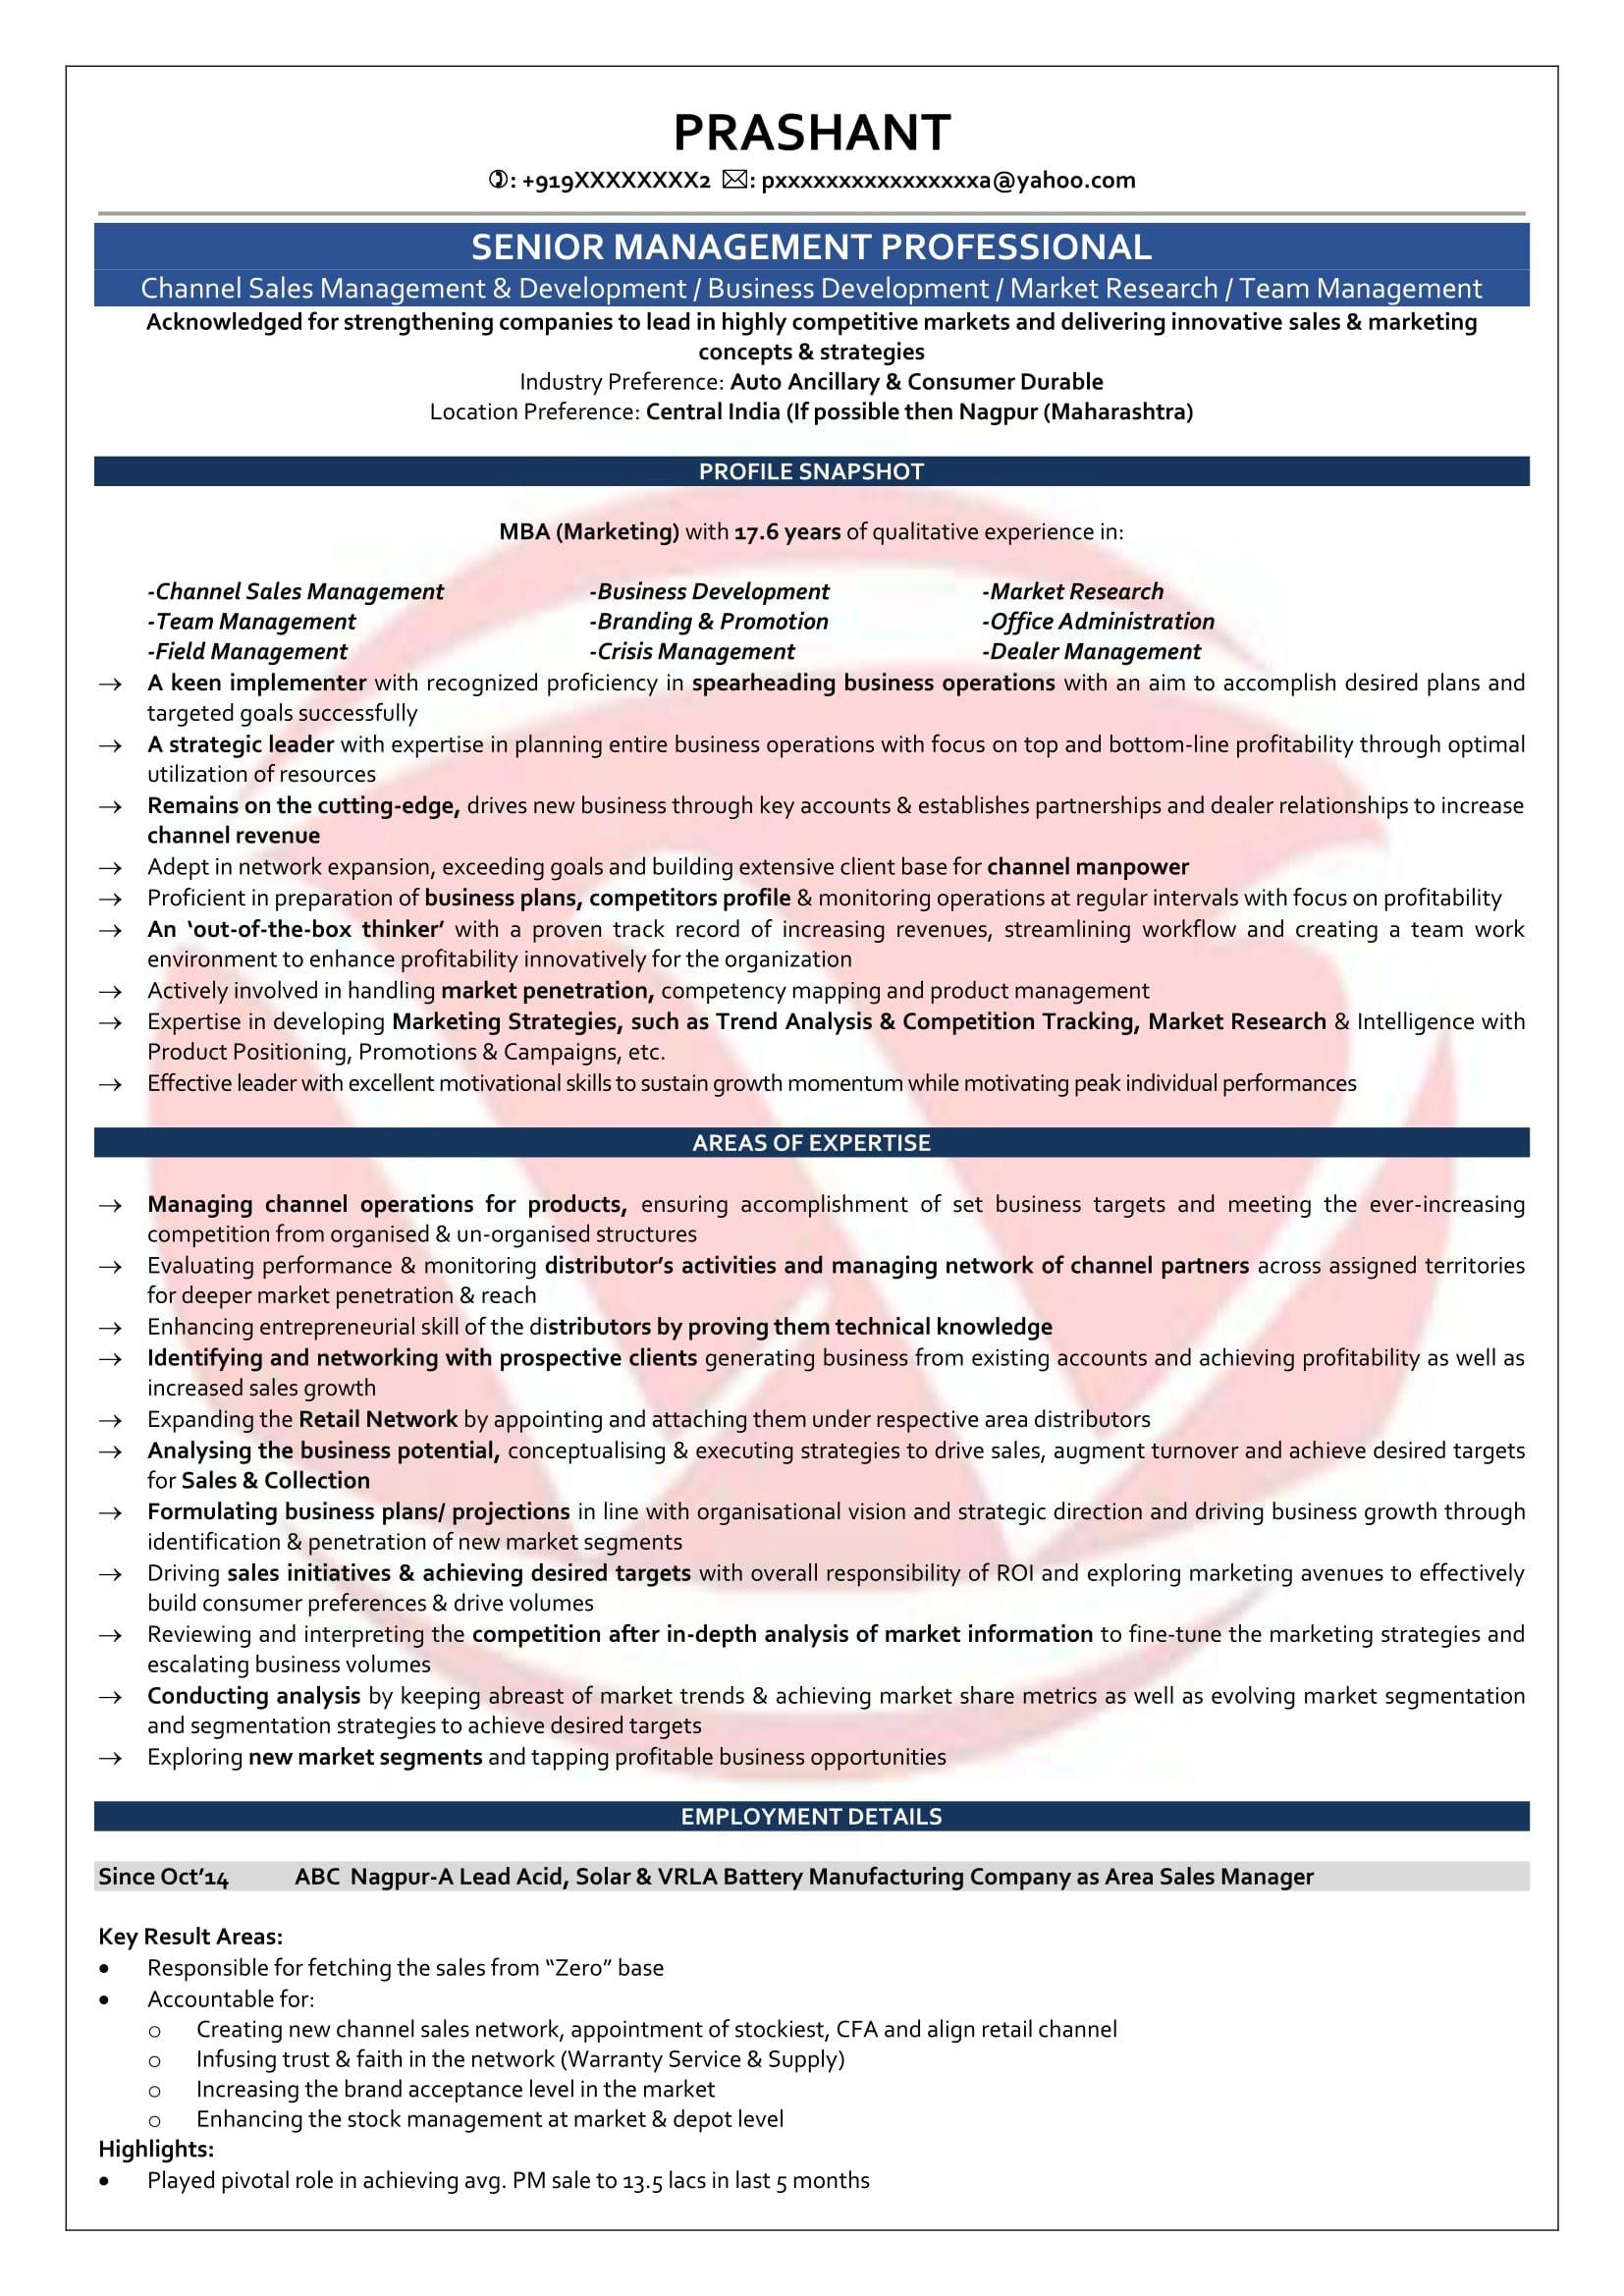 Sample Resume Format For 5 Years Experience ResumeFormat